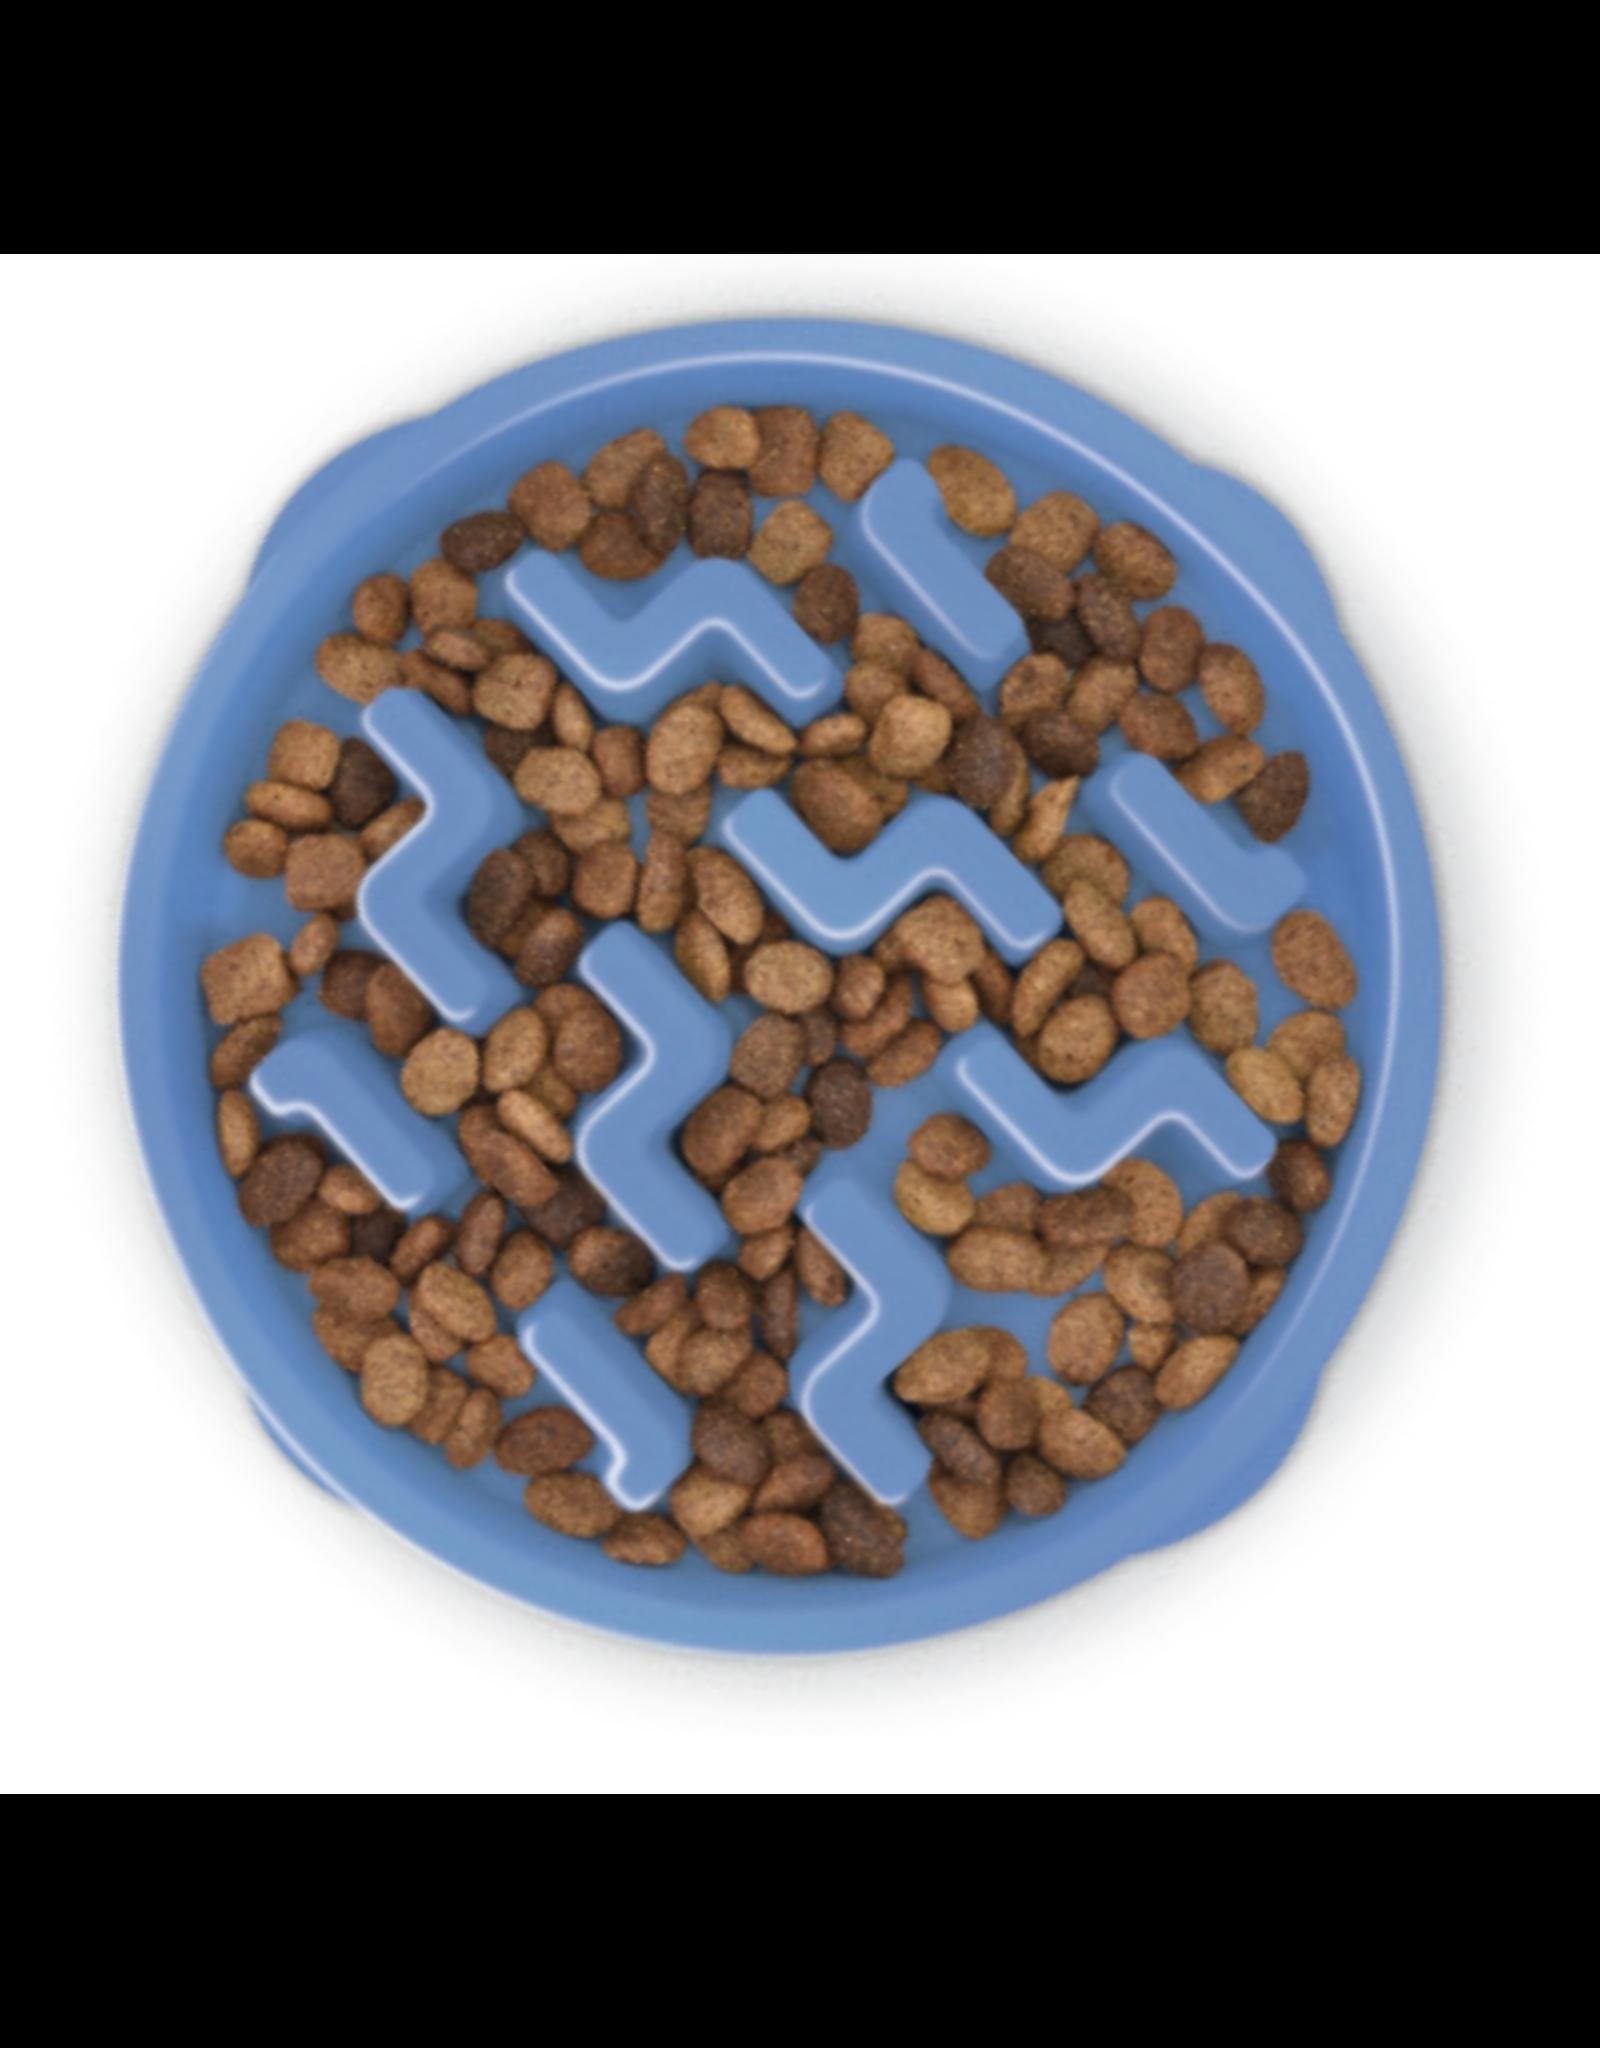 Outward Hound Outward Hound Fun Feeder Slo-Bowl for Dogs - Blue